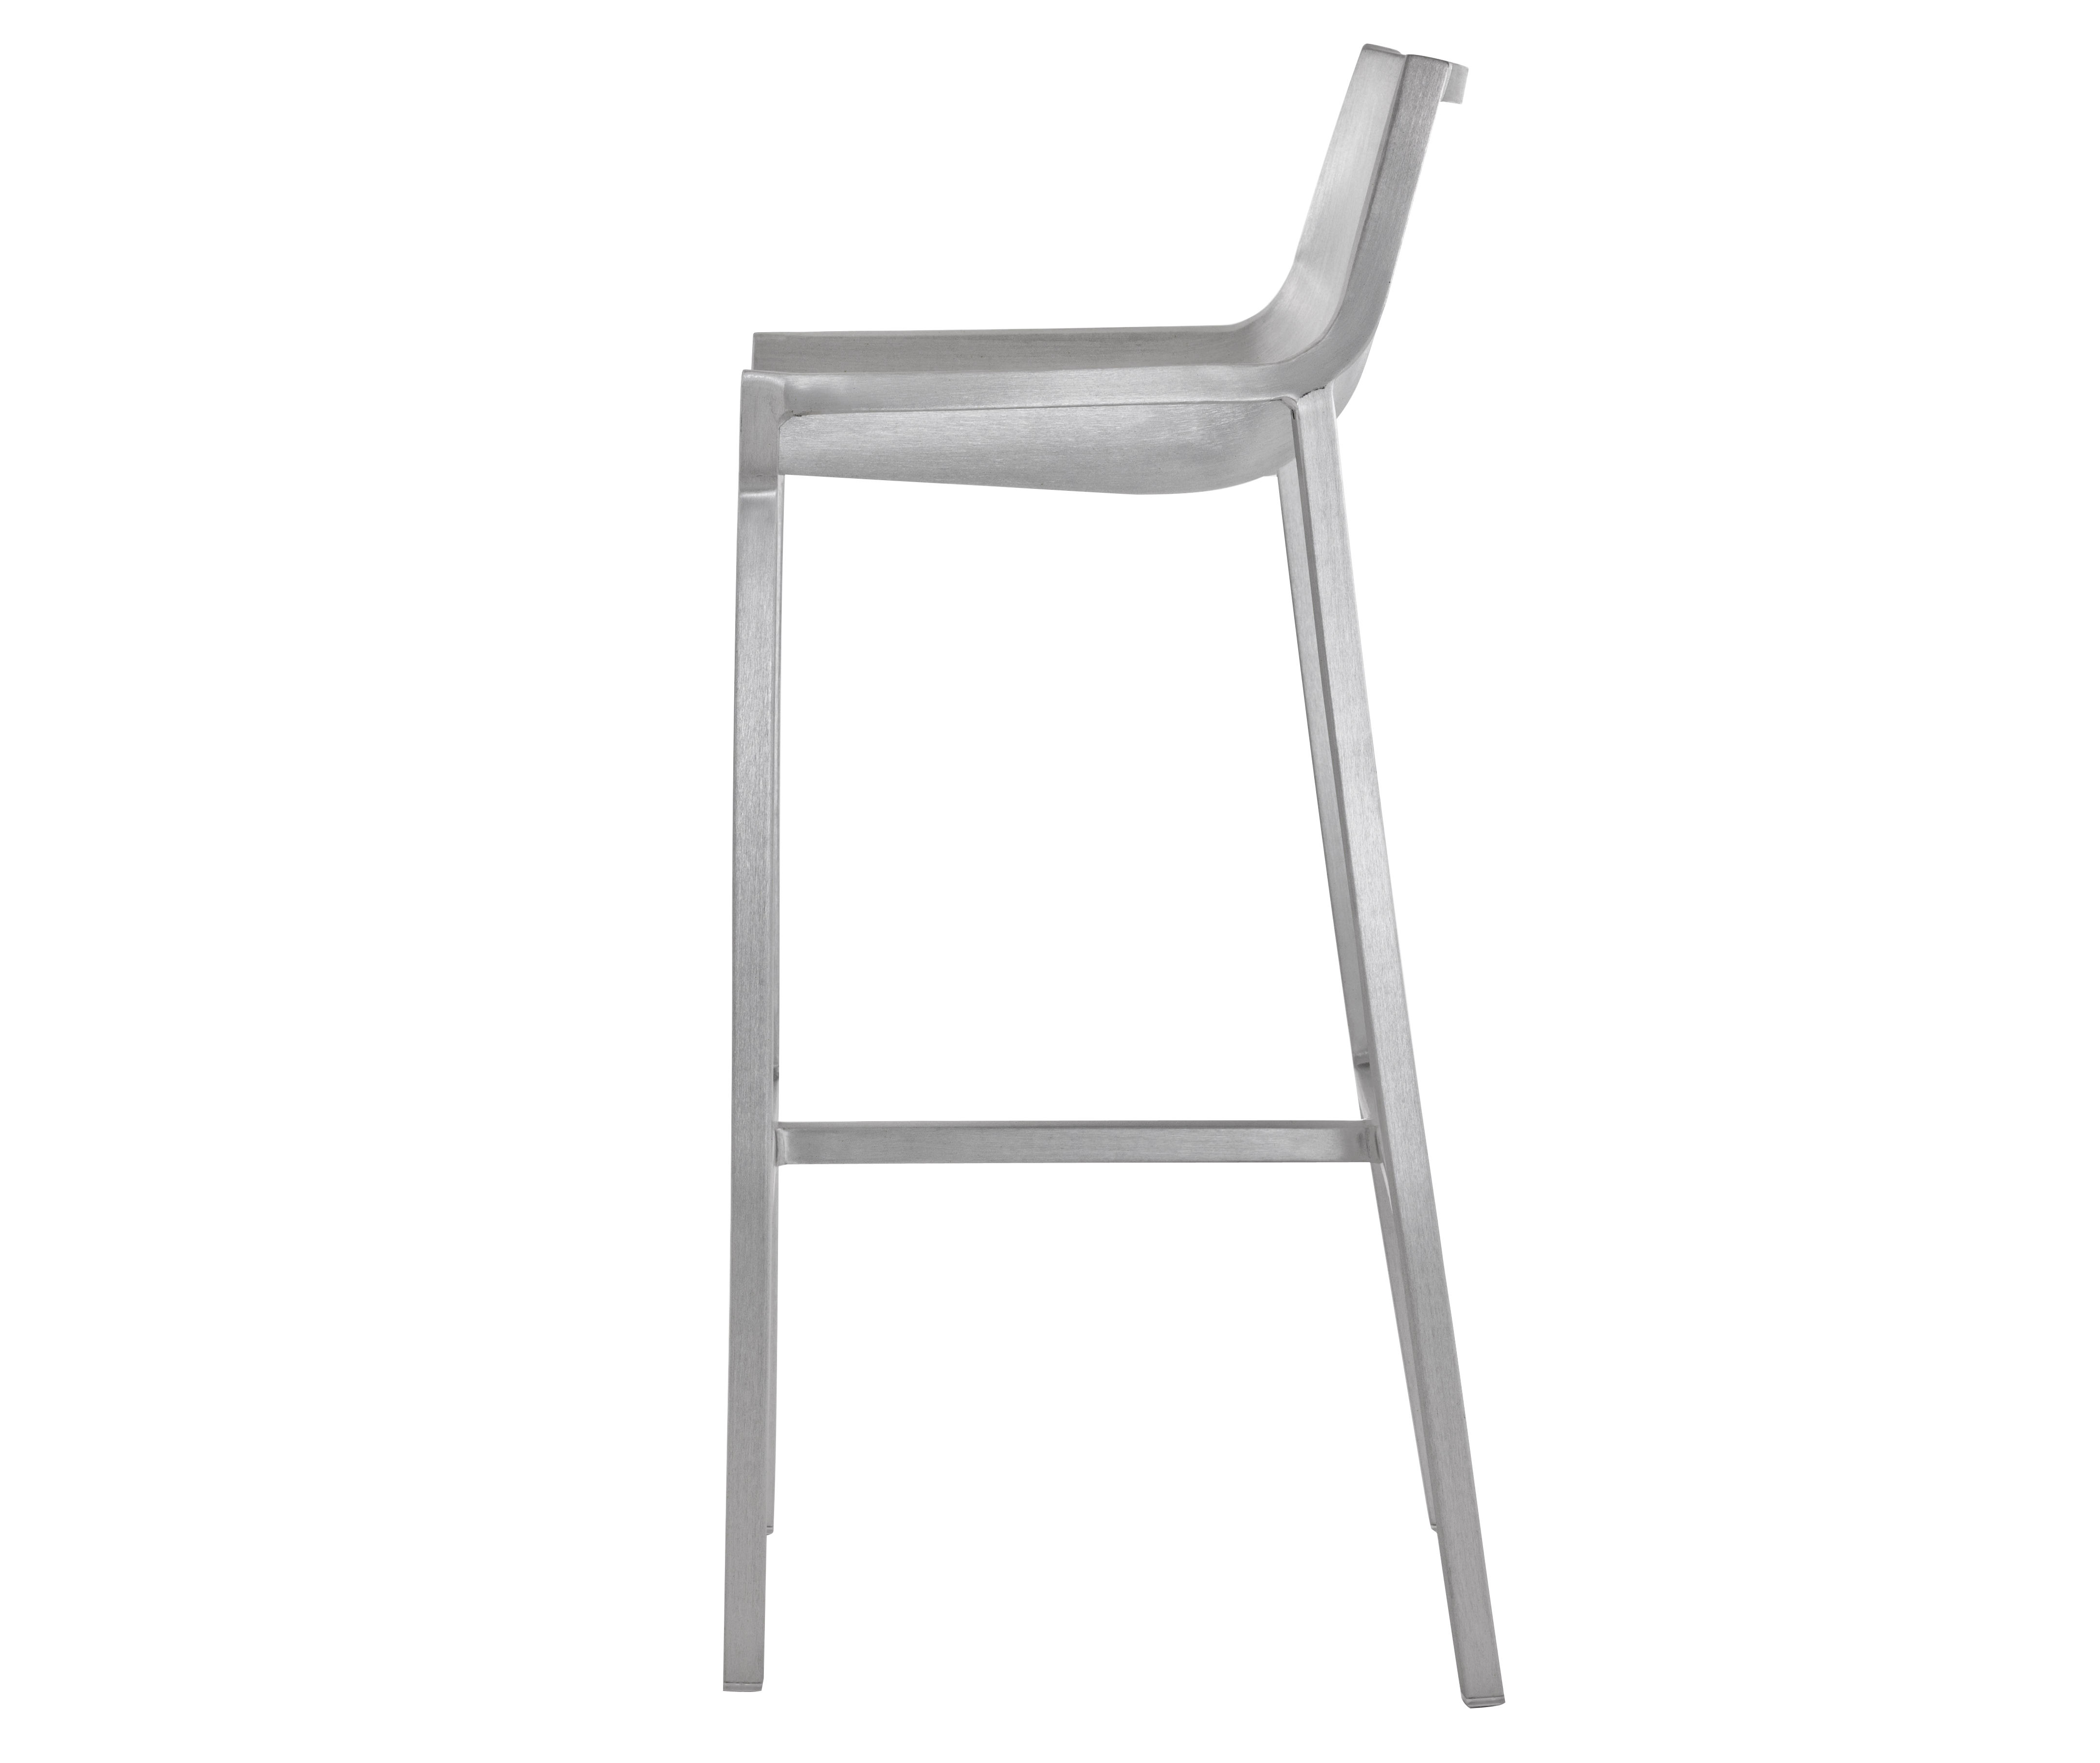 Furniture - Bar Stools - Sezz Bar chair - H 76 cm - Aluminium by Emeco - Brushed aluminium - Brushed aluminium